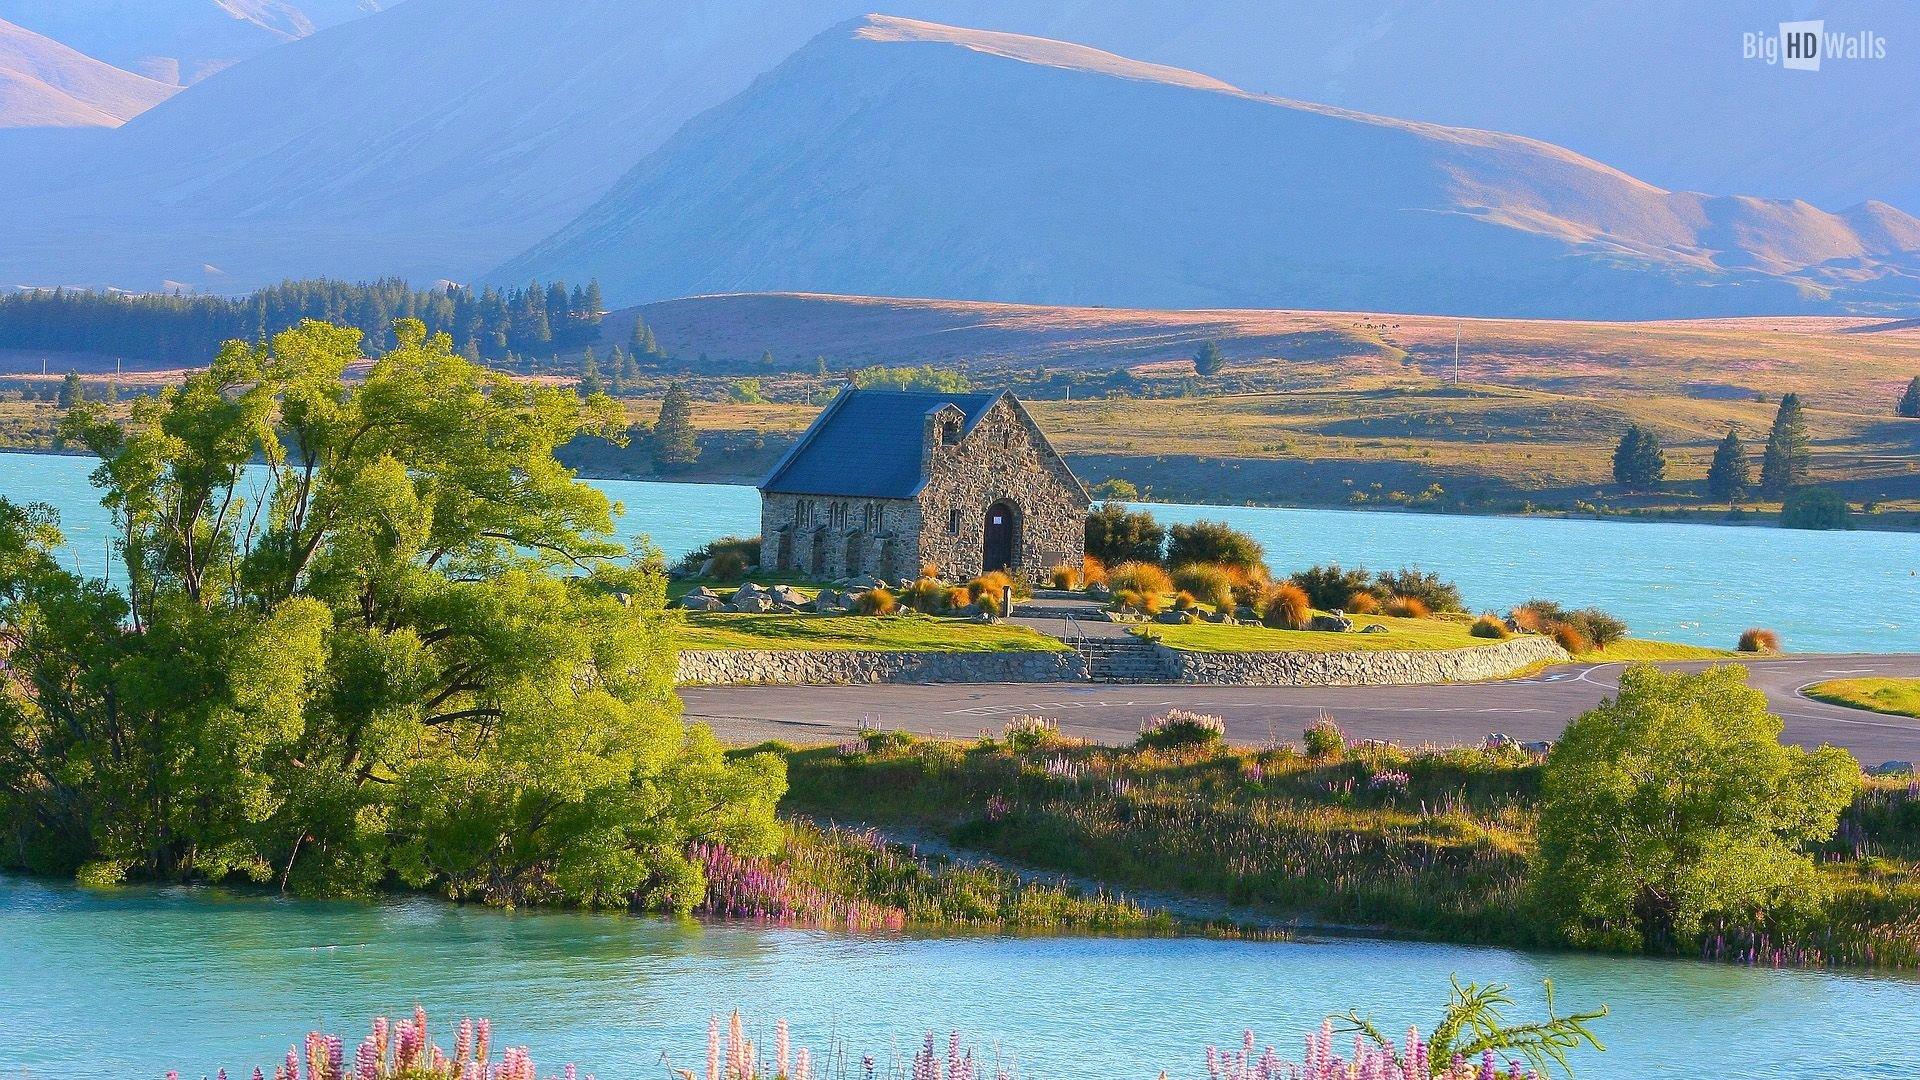 Lush View Of Lake Tekapo In New Zealand Hd Wallpaper